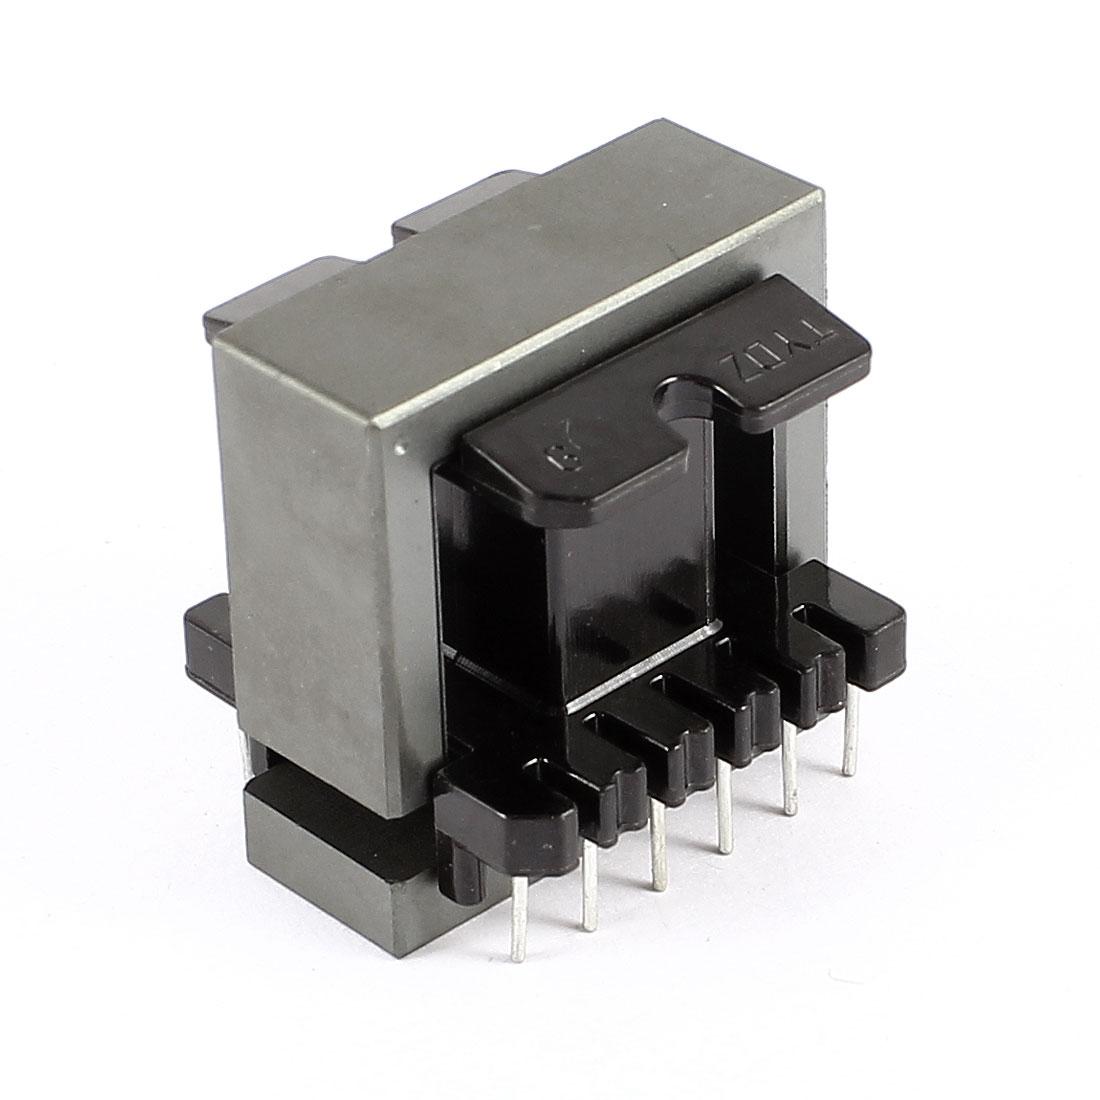 Plastic Iron Inductor 12 Pin Transformers Coil Former Robbin EI33 Ferrite Core Bobbin Black